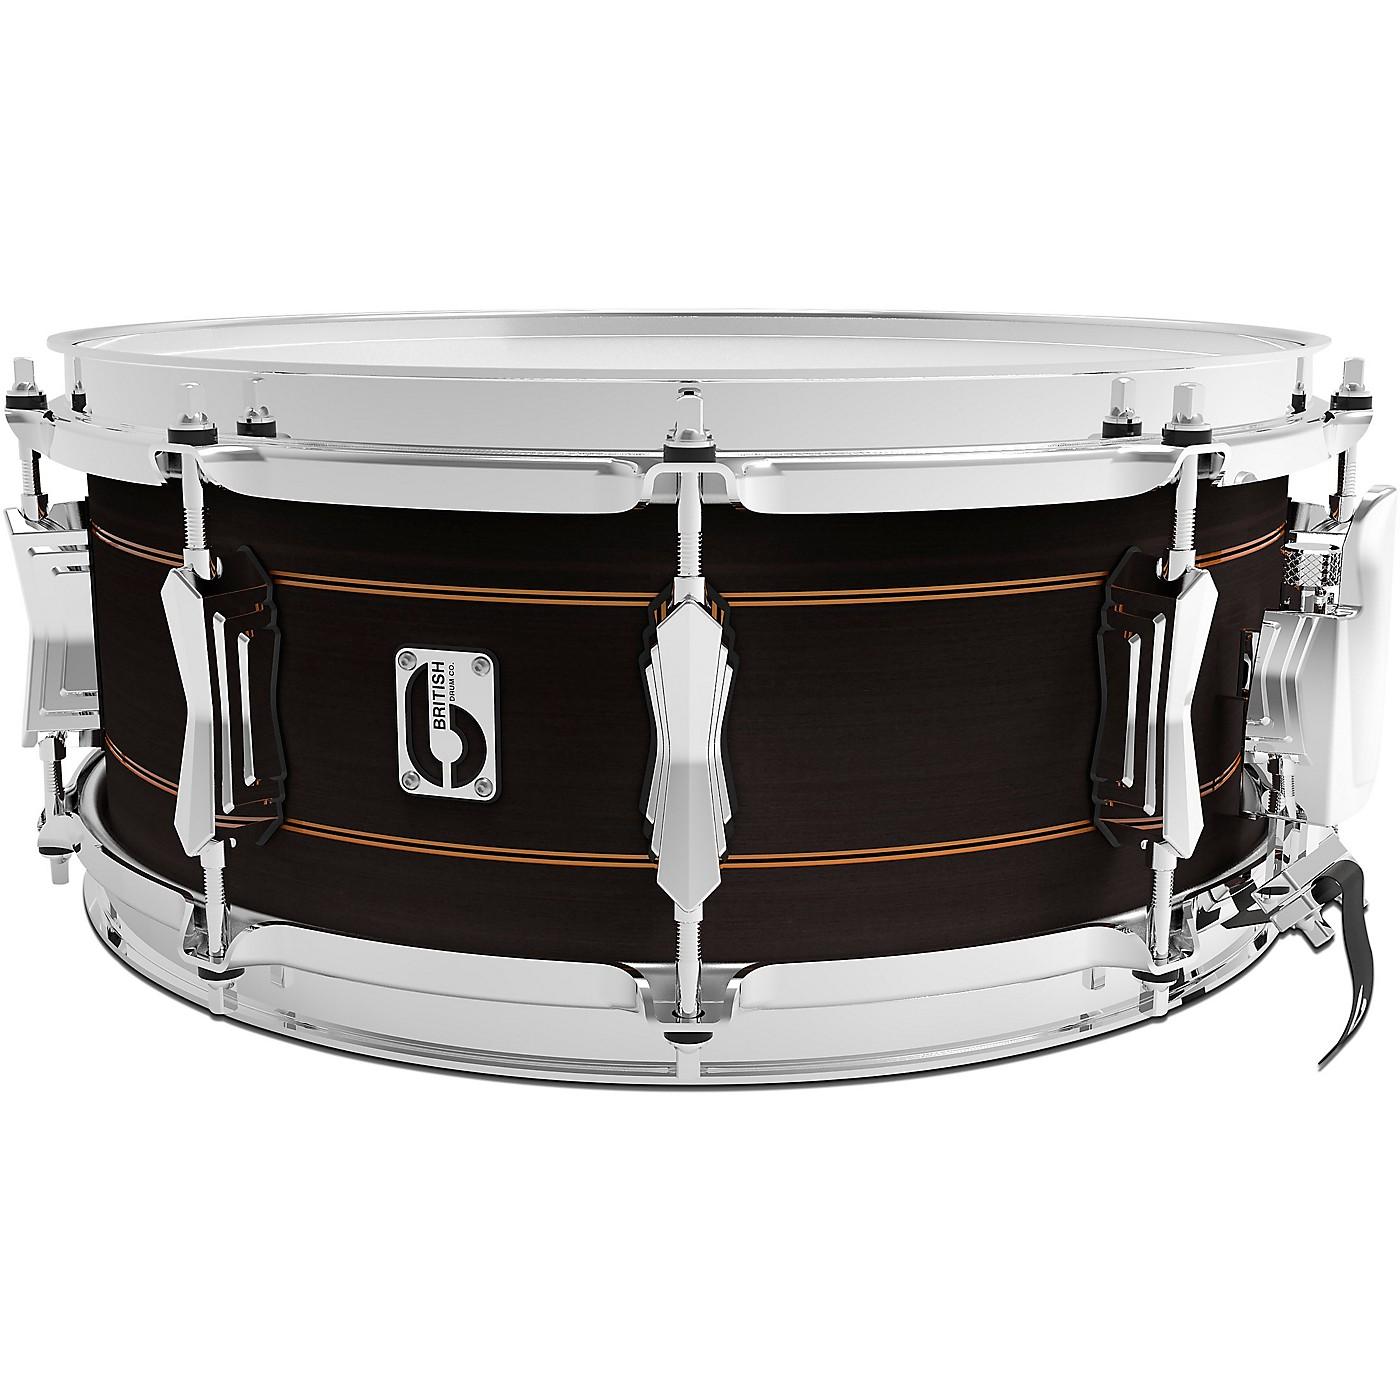 British Drum Co. Merlin Snare Drum thumbnail